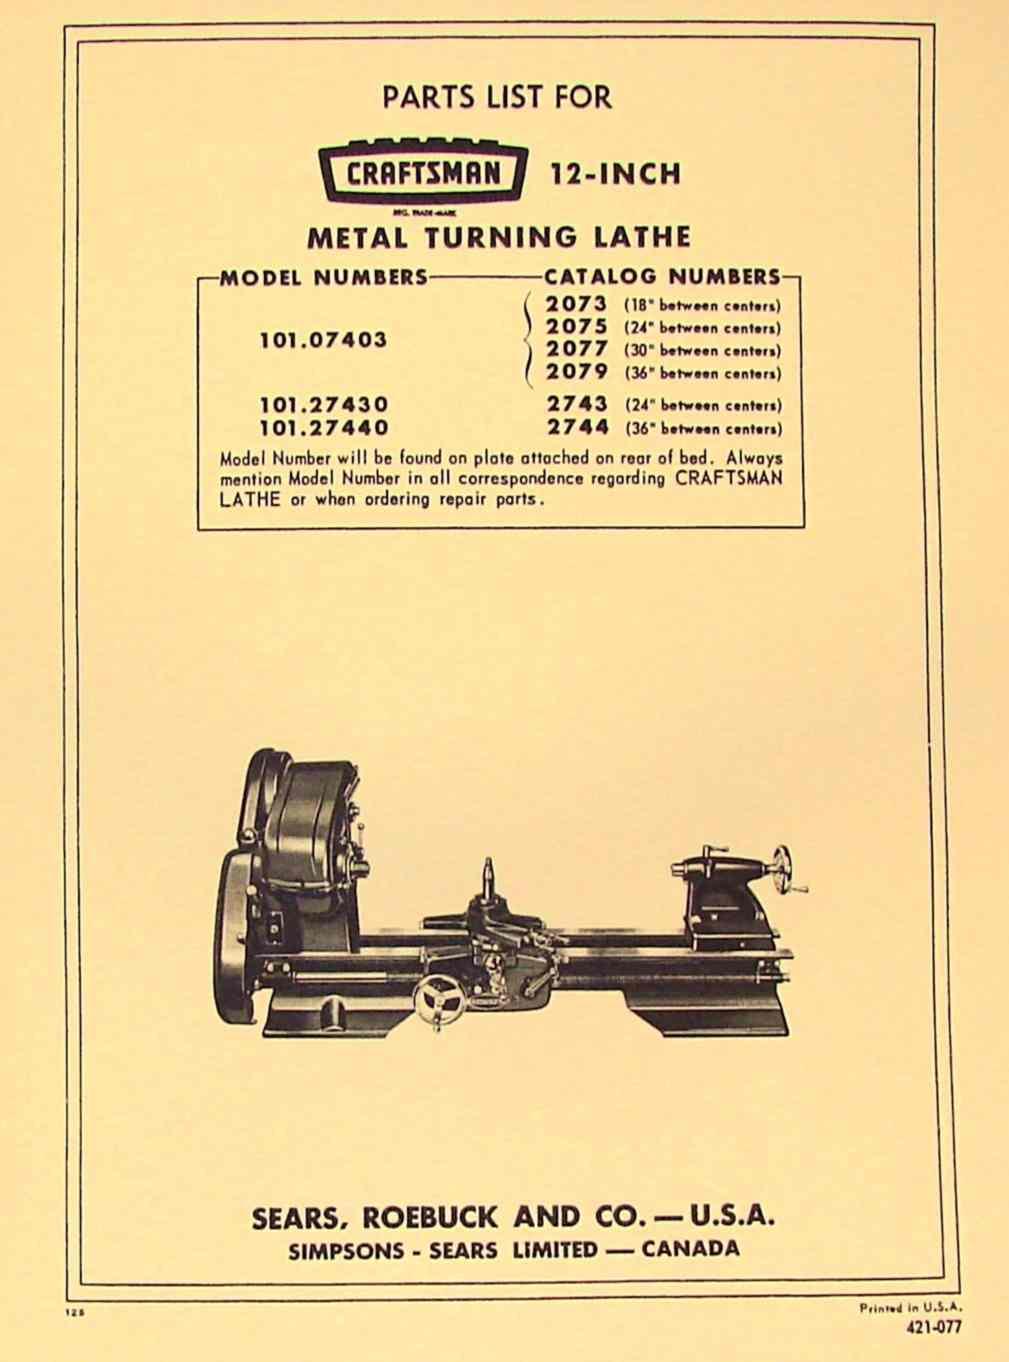 Craftsman Atlas 12 Lathe 101 07403 101 27430 101 27440 Parts